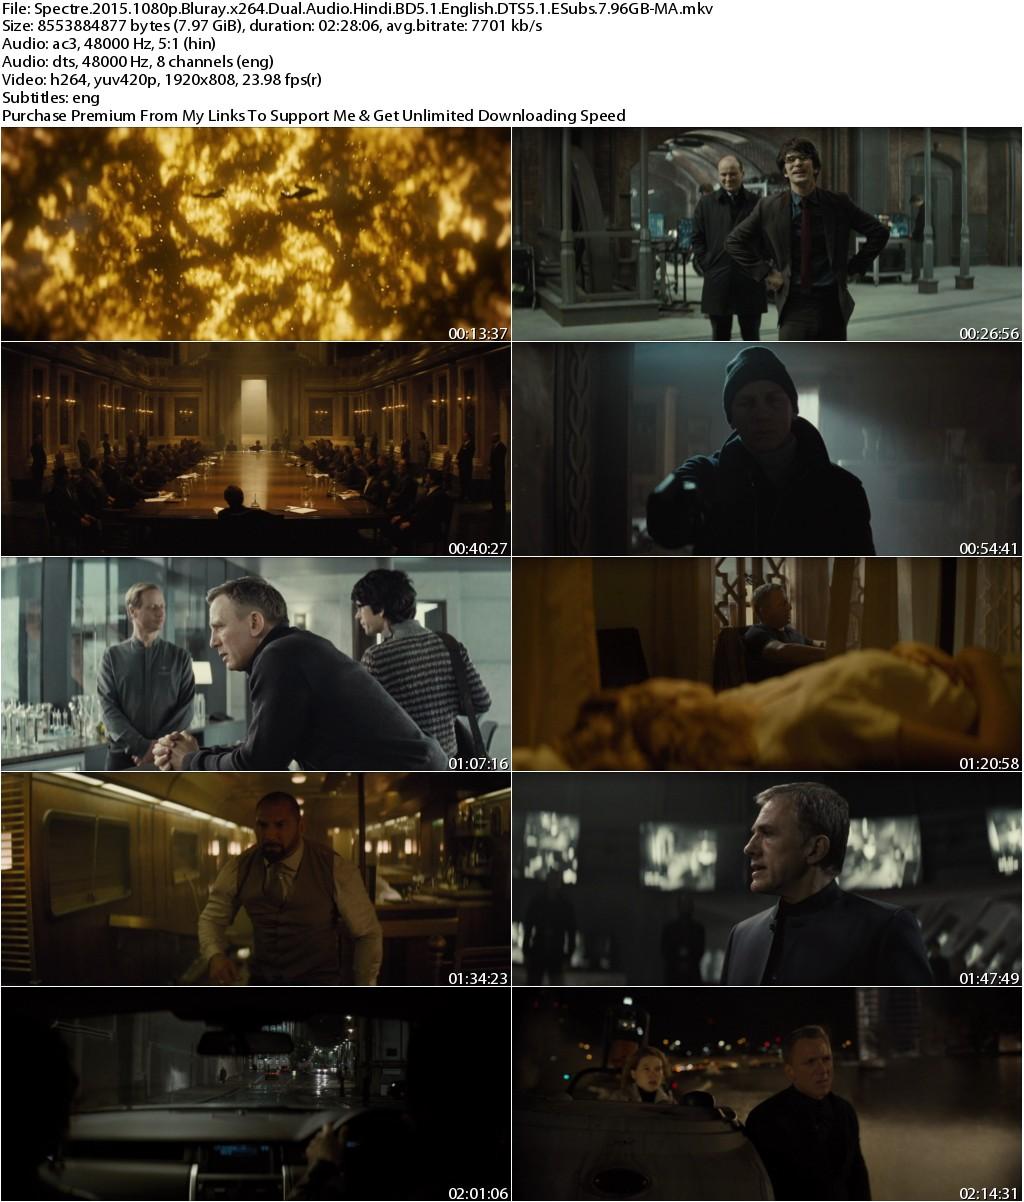 Spectre (2015) 1080p Bluray x264 Dual Audio Hindi BD5.1 English DTS5.1 ESubs 7.96GB-MA